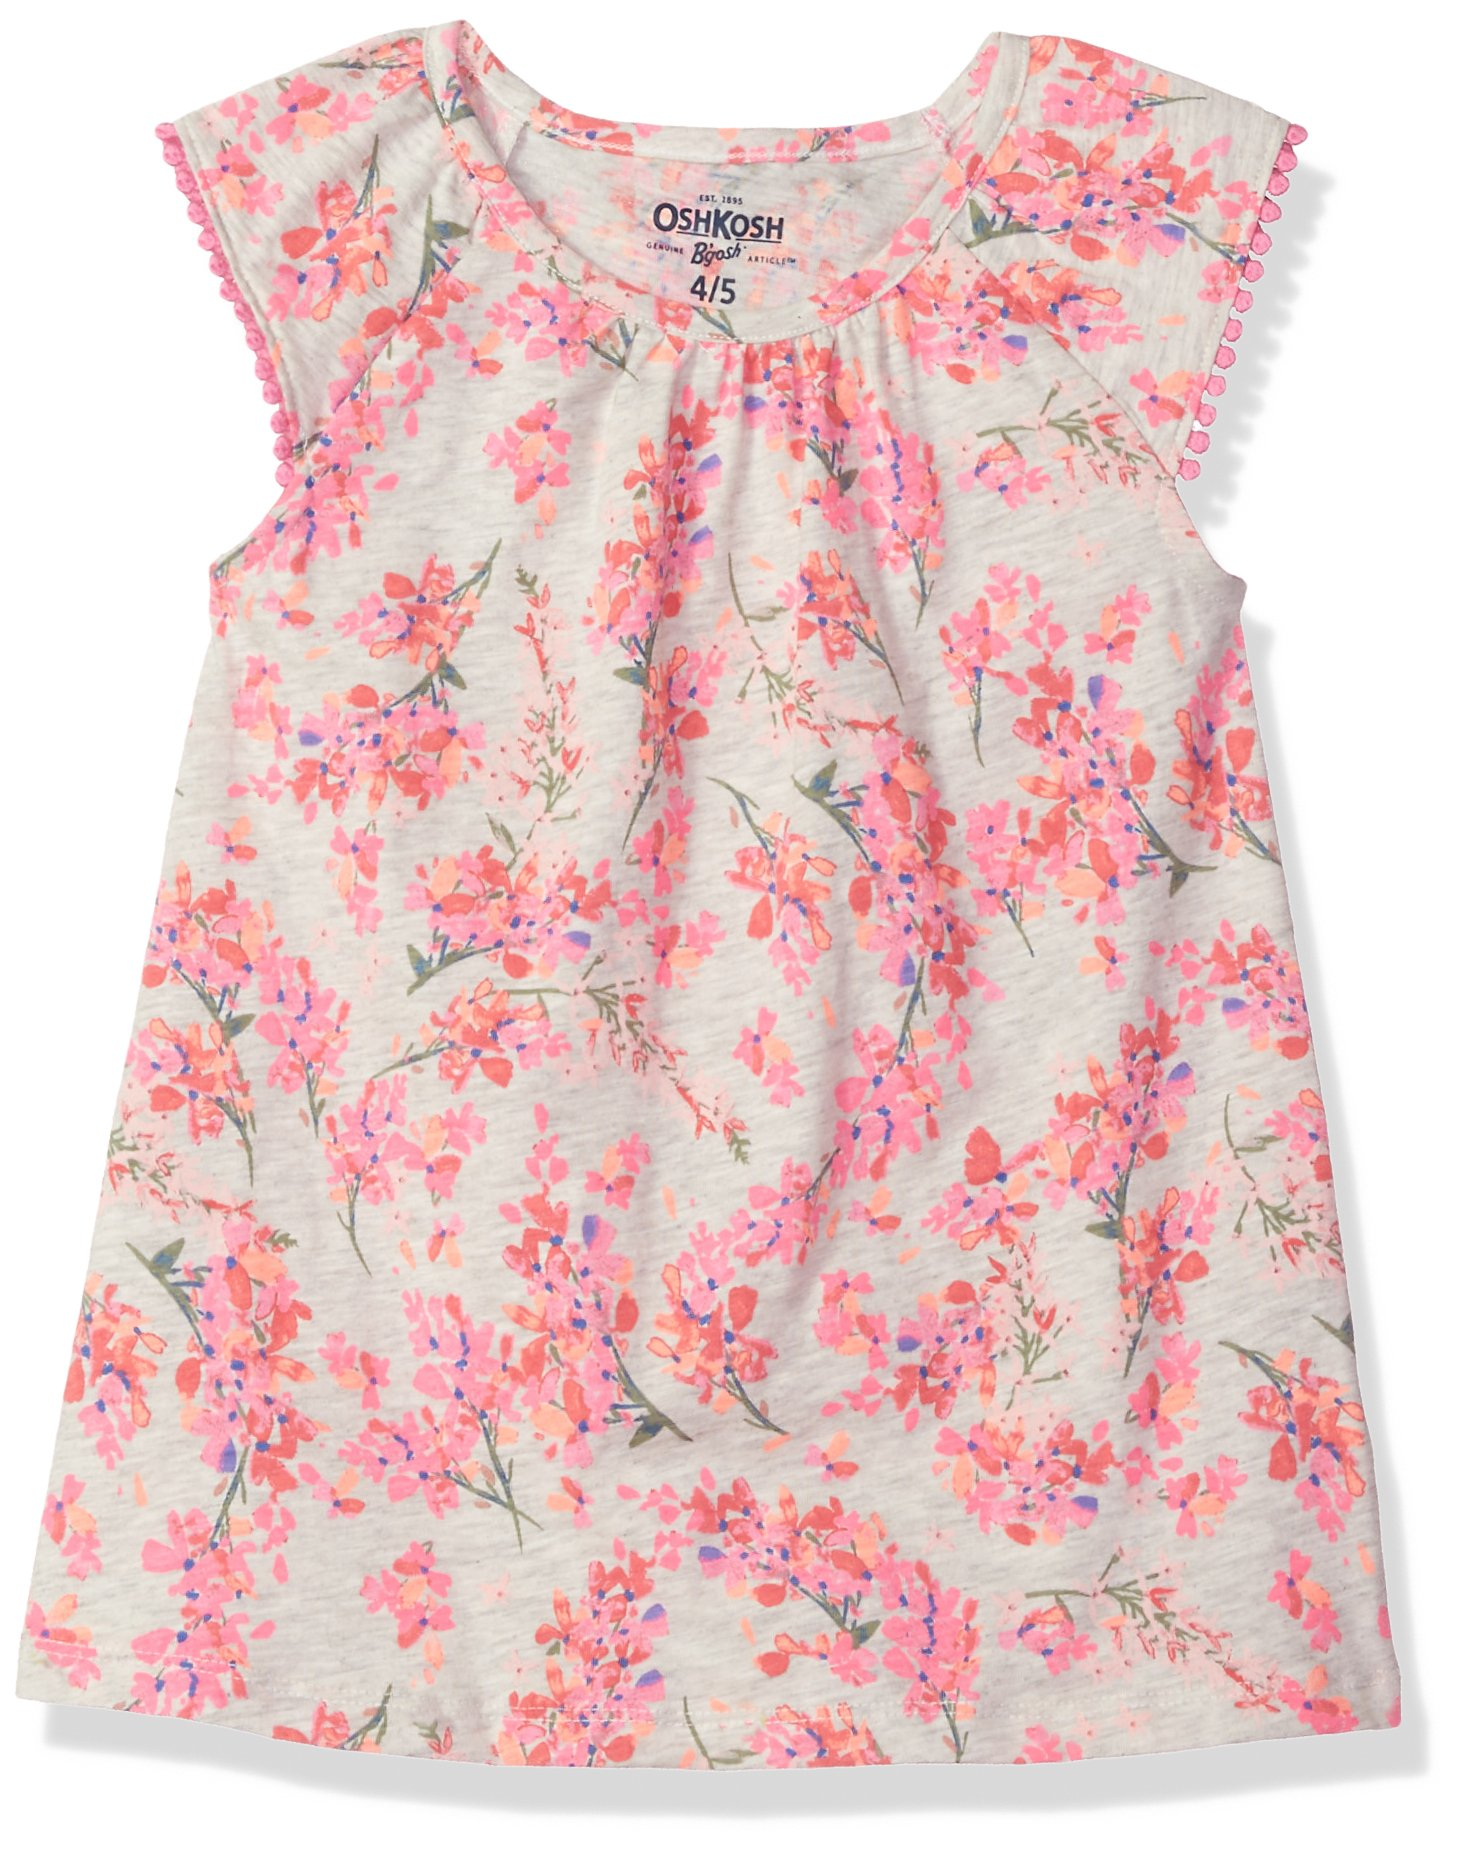 Osh Kosh Girls' Kids Fashion Tops, Grey Floral, 4-5